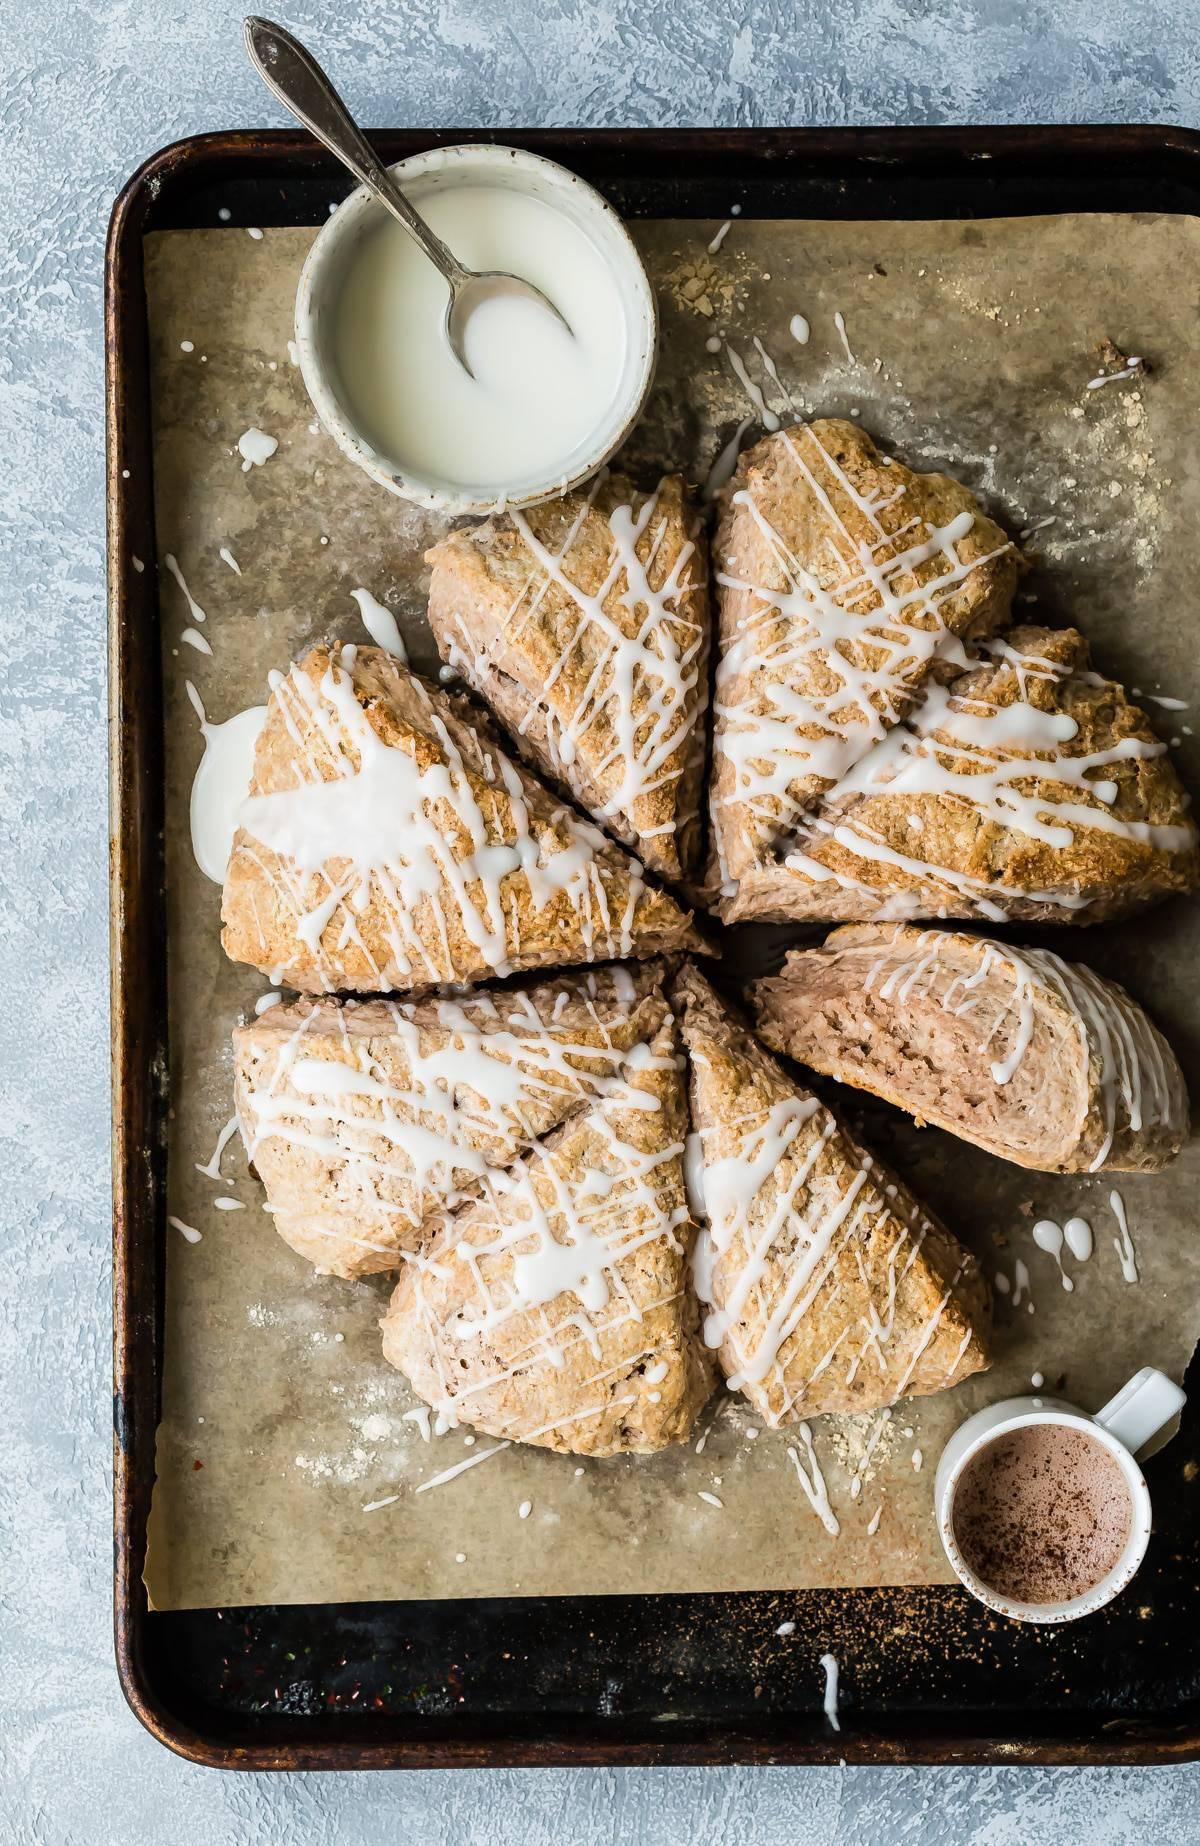 Fresh bakes buttermilk scones on a sheet pan